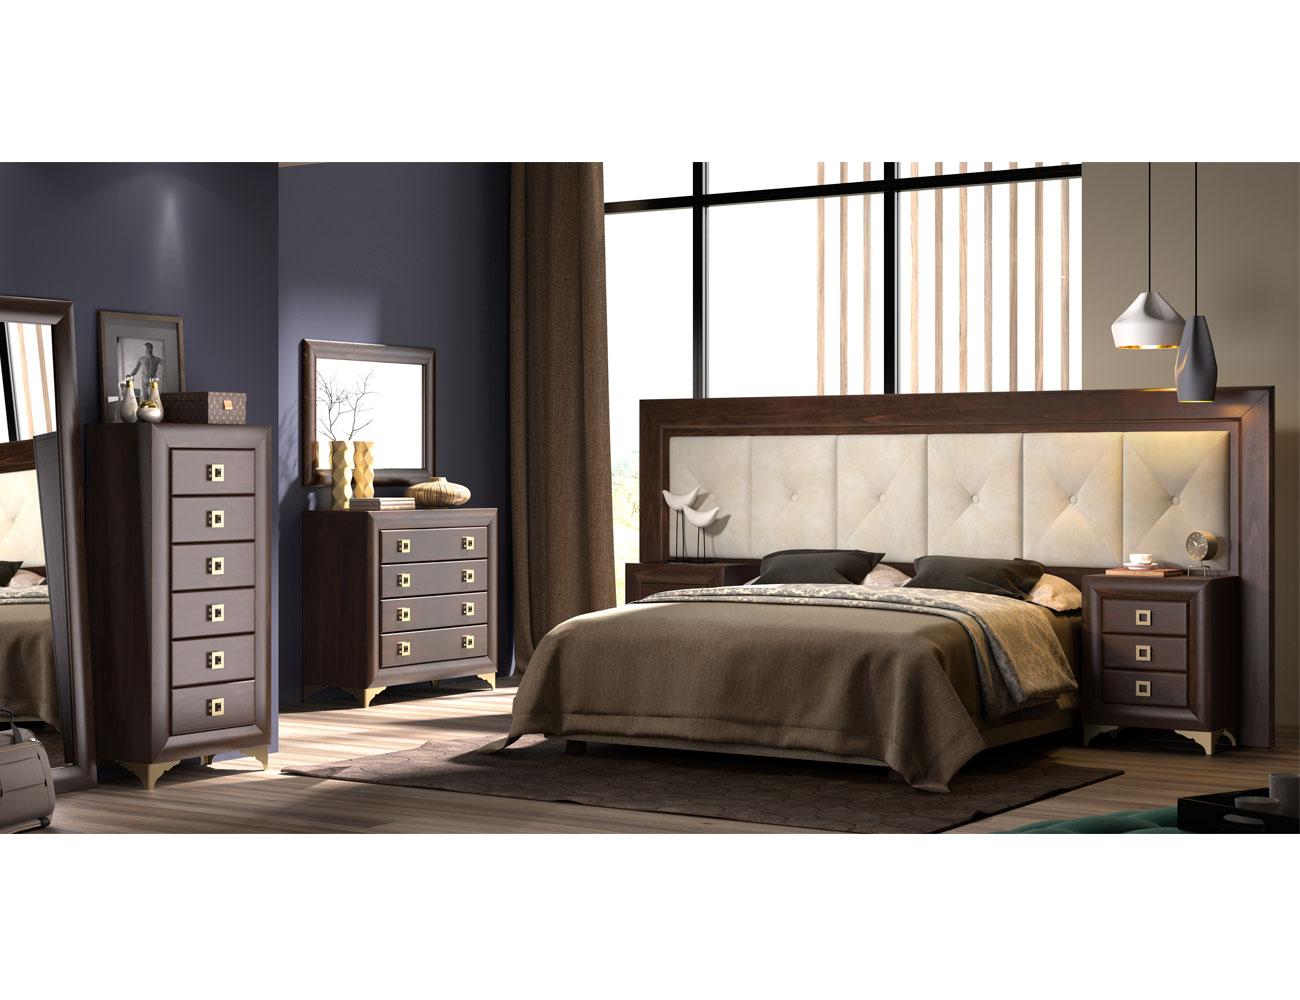 Dormitorio matrimonio nogal tapizado patas cabecero 285cm1